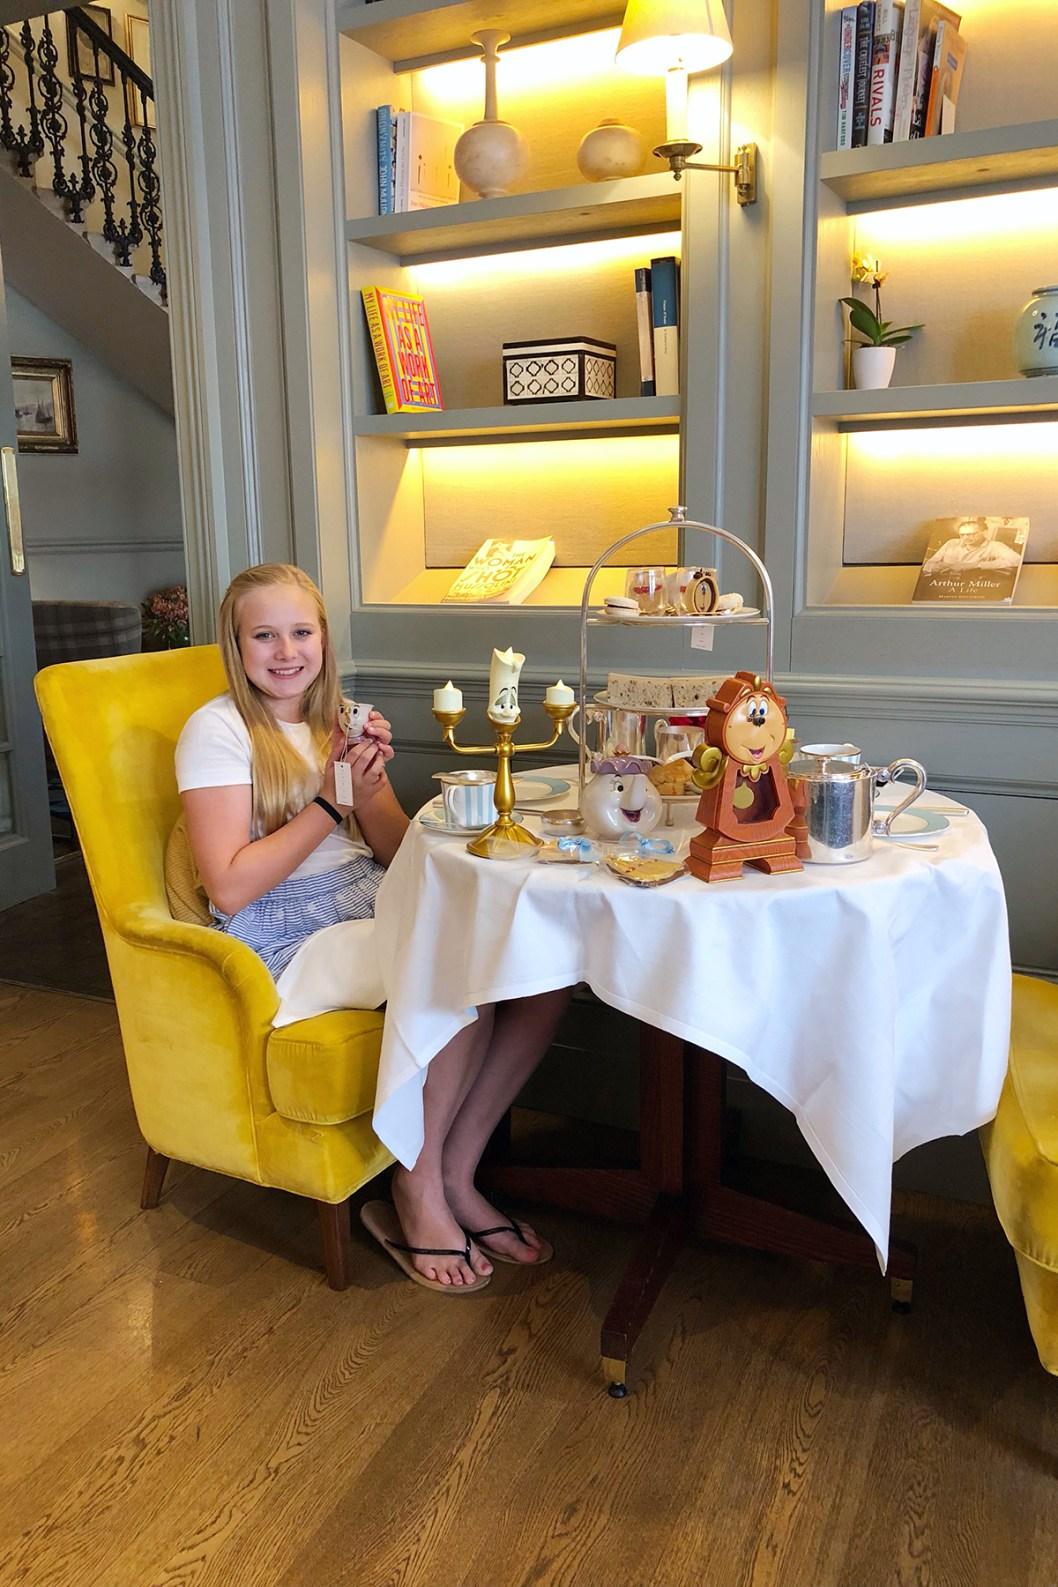 The kensington hotel afternoon tea 2